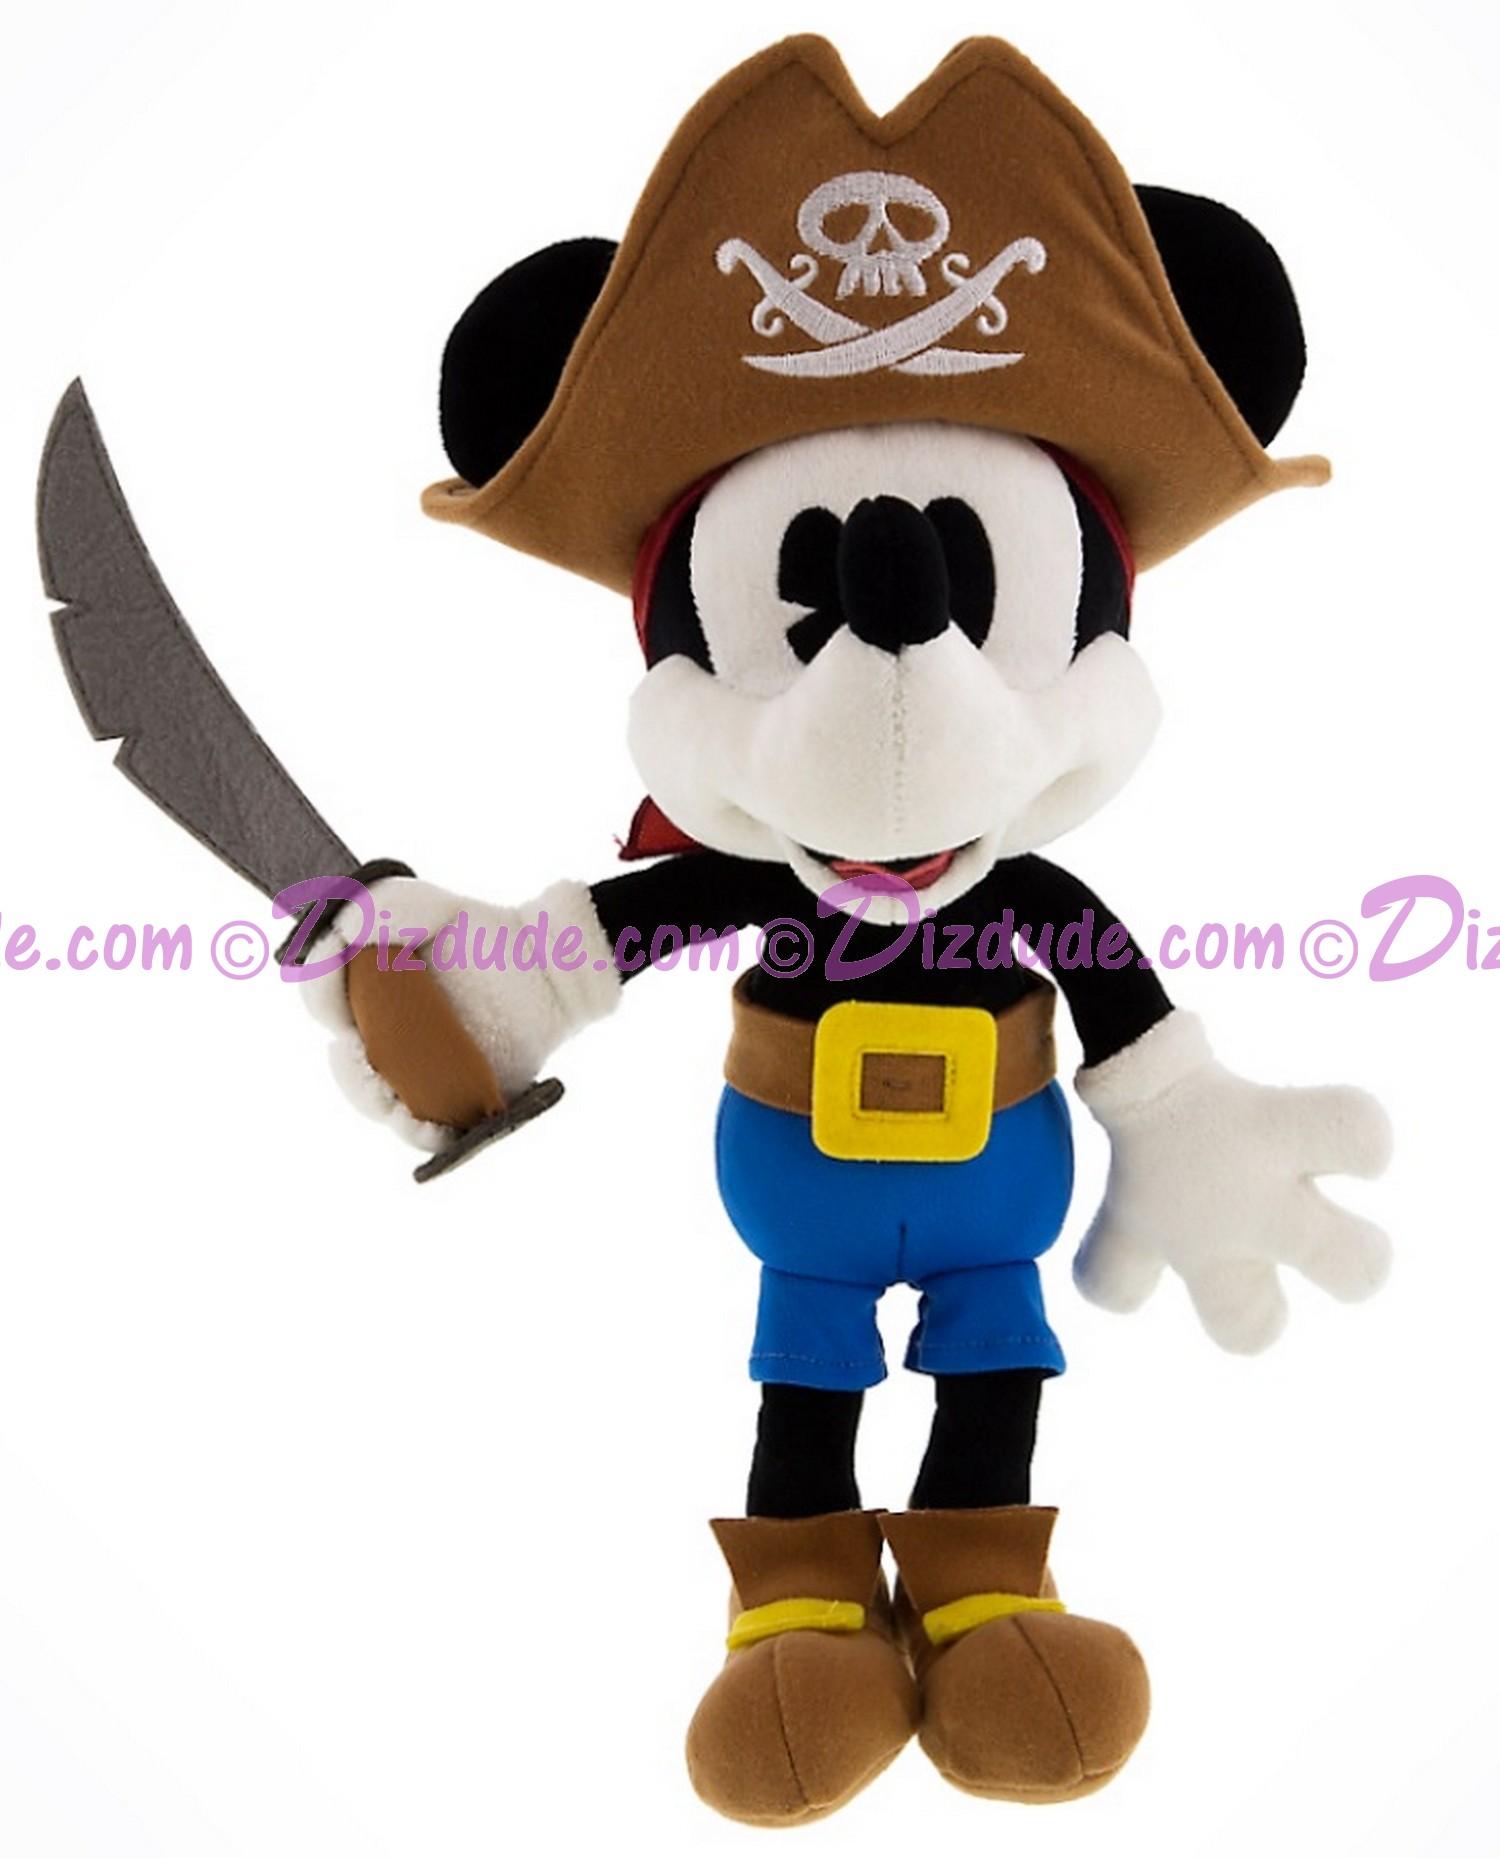 Pirate Mickey Mouse 9 inch (23 cm) Plush ~ Pirates of the Caribbean © Dizdude.com